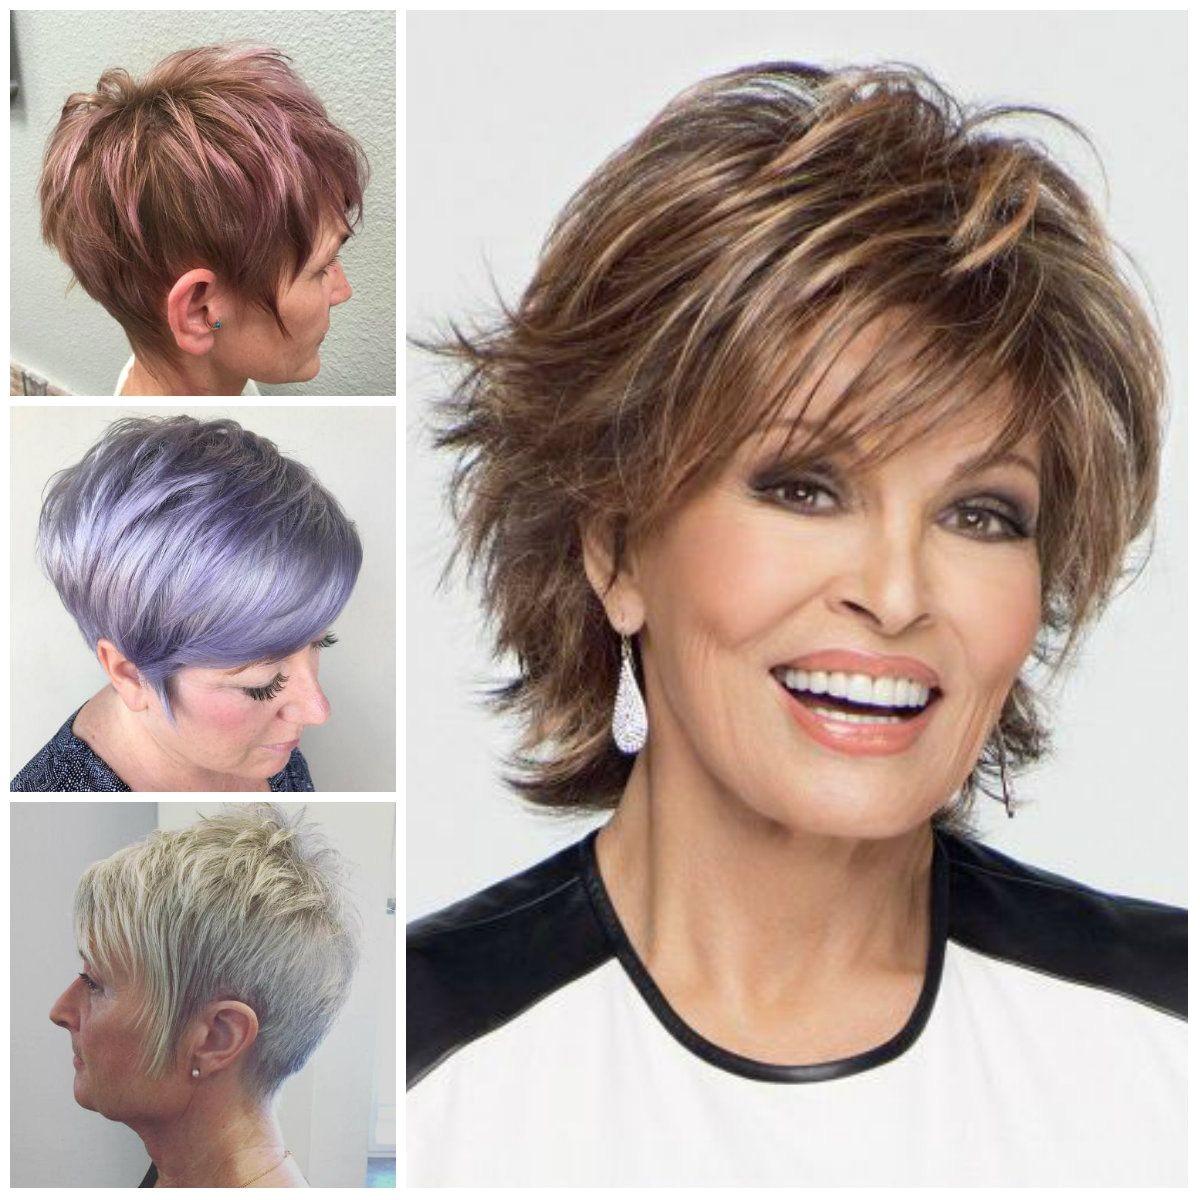 2017 Short Hairstyles for Older Women